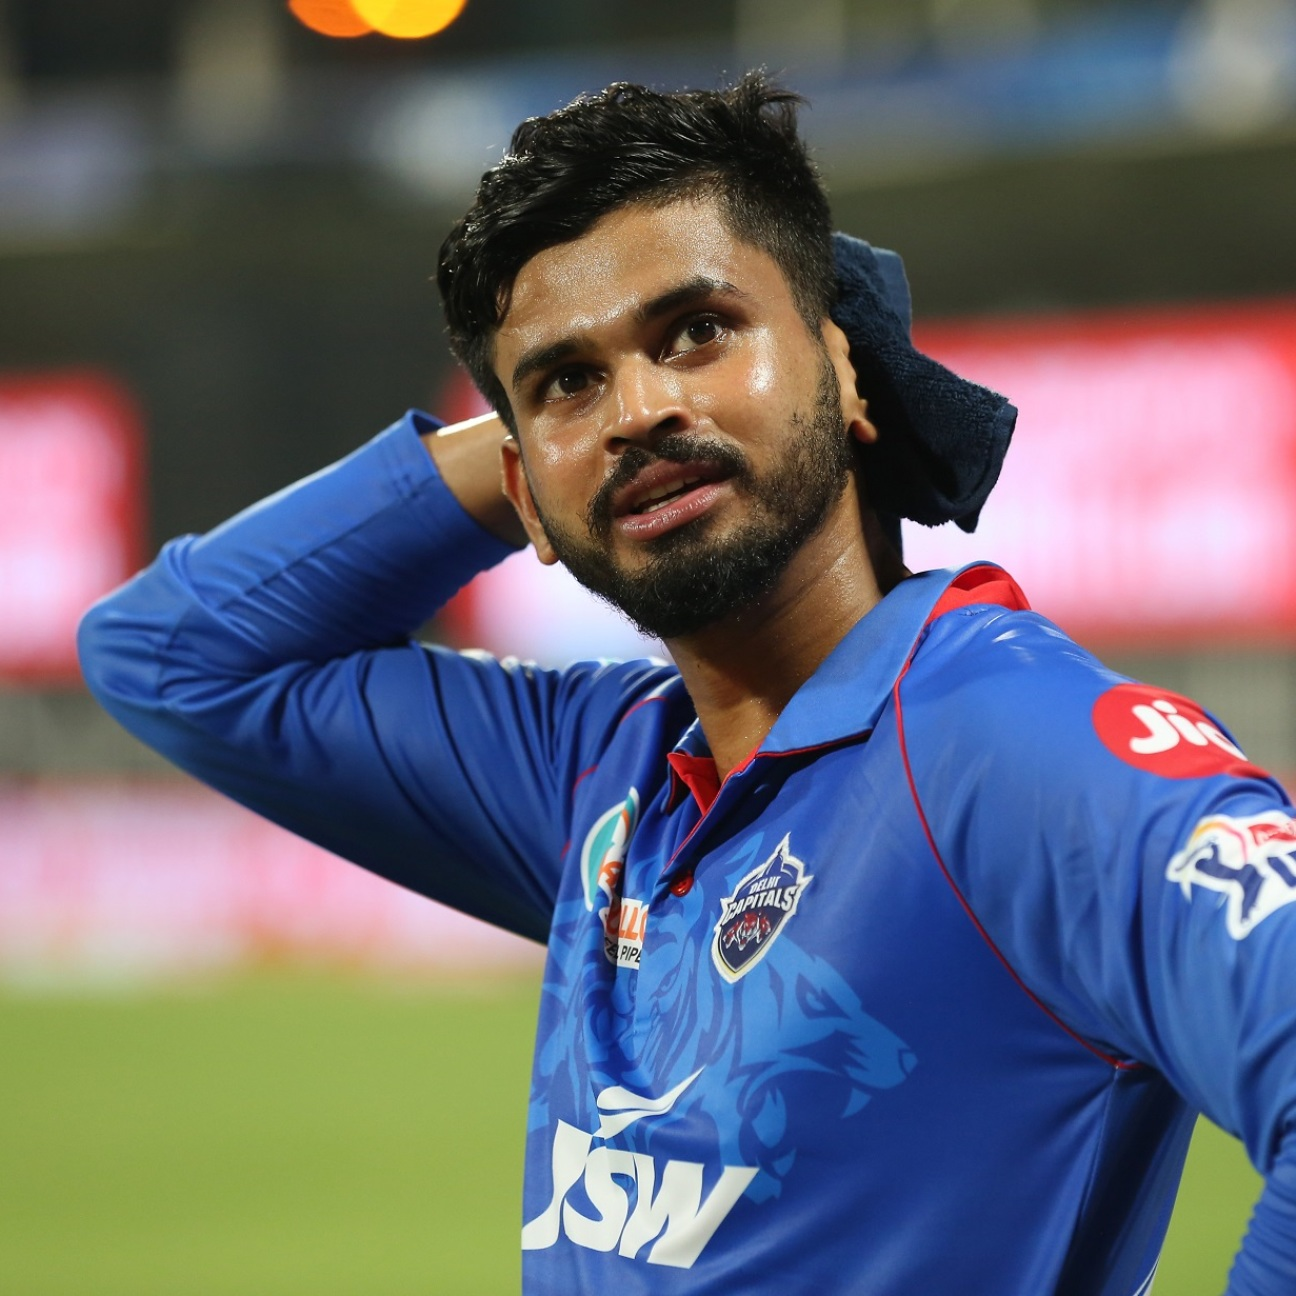 IPL 2021: UAE রওনা হল দিল্লি ক্যাপিটালস দল, আগে থেকেই রয়েছেন শ্রেয়াস আইয়ার 3